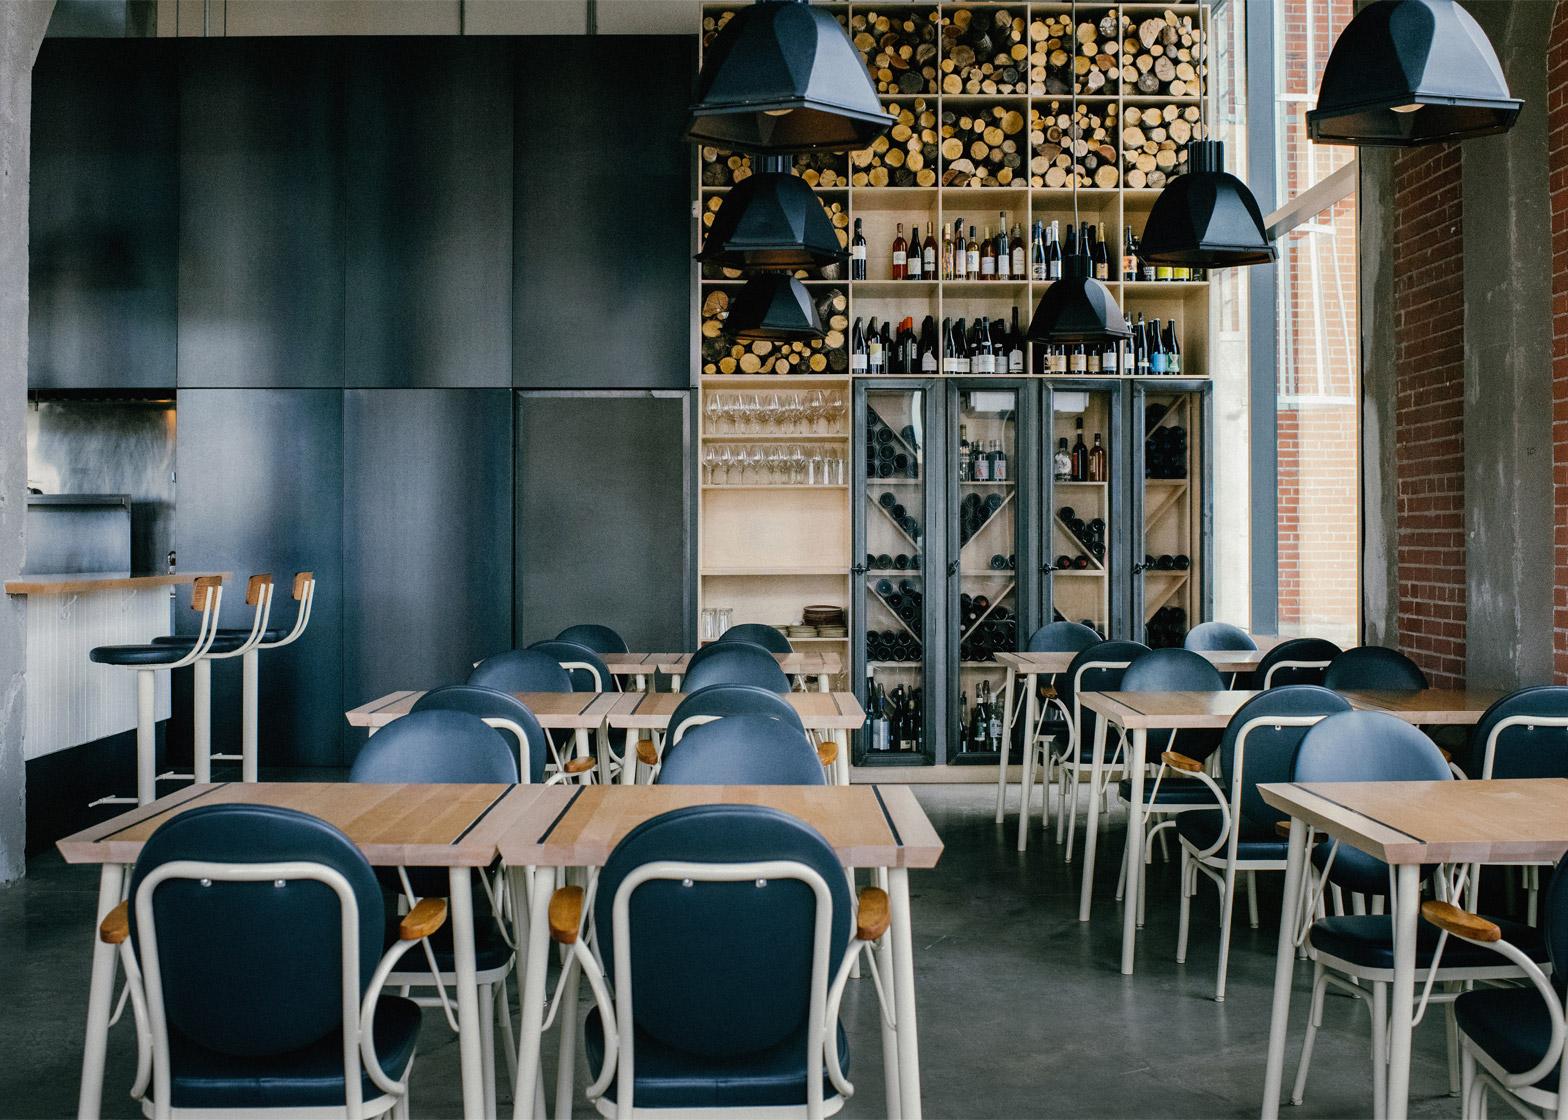 04-restaurante-montreal-antiga-fabrica-transformacao